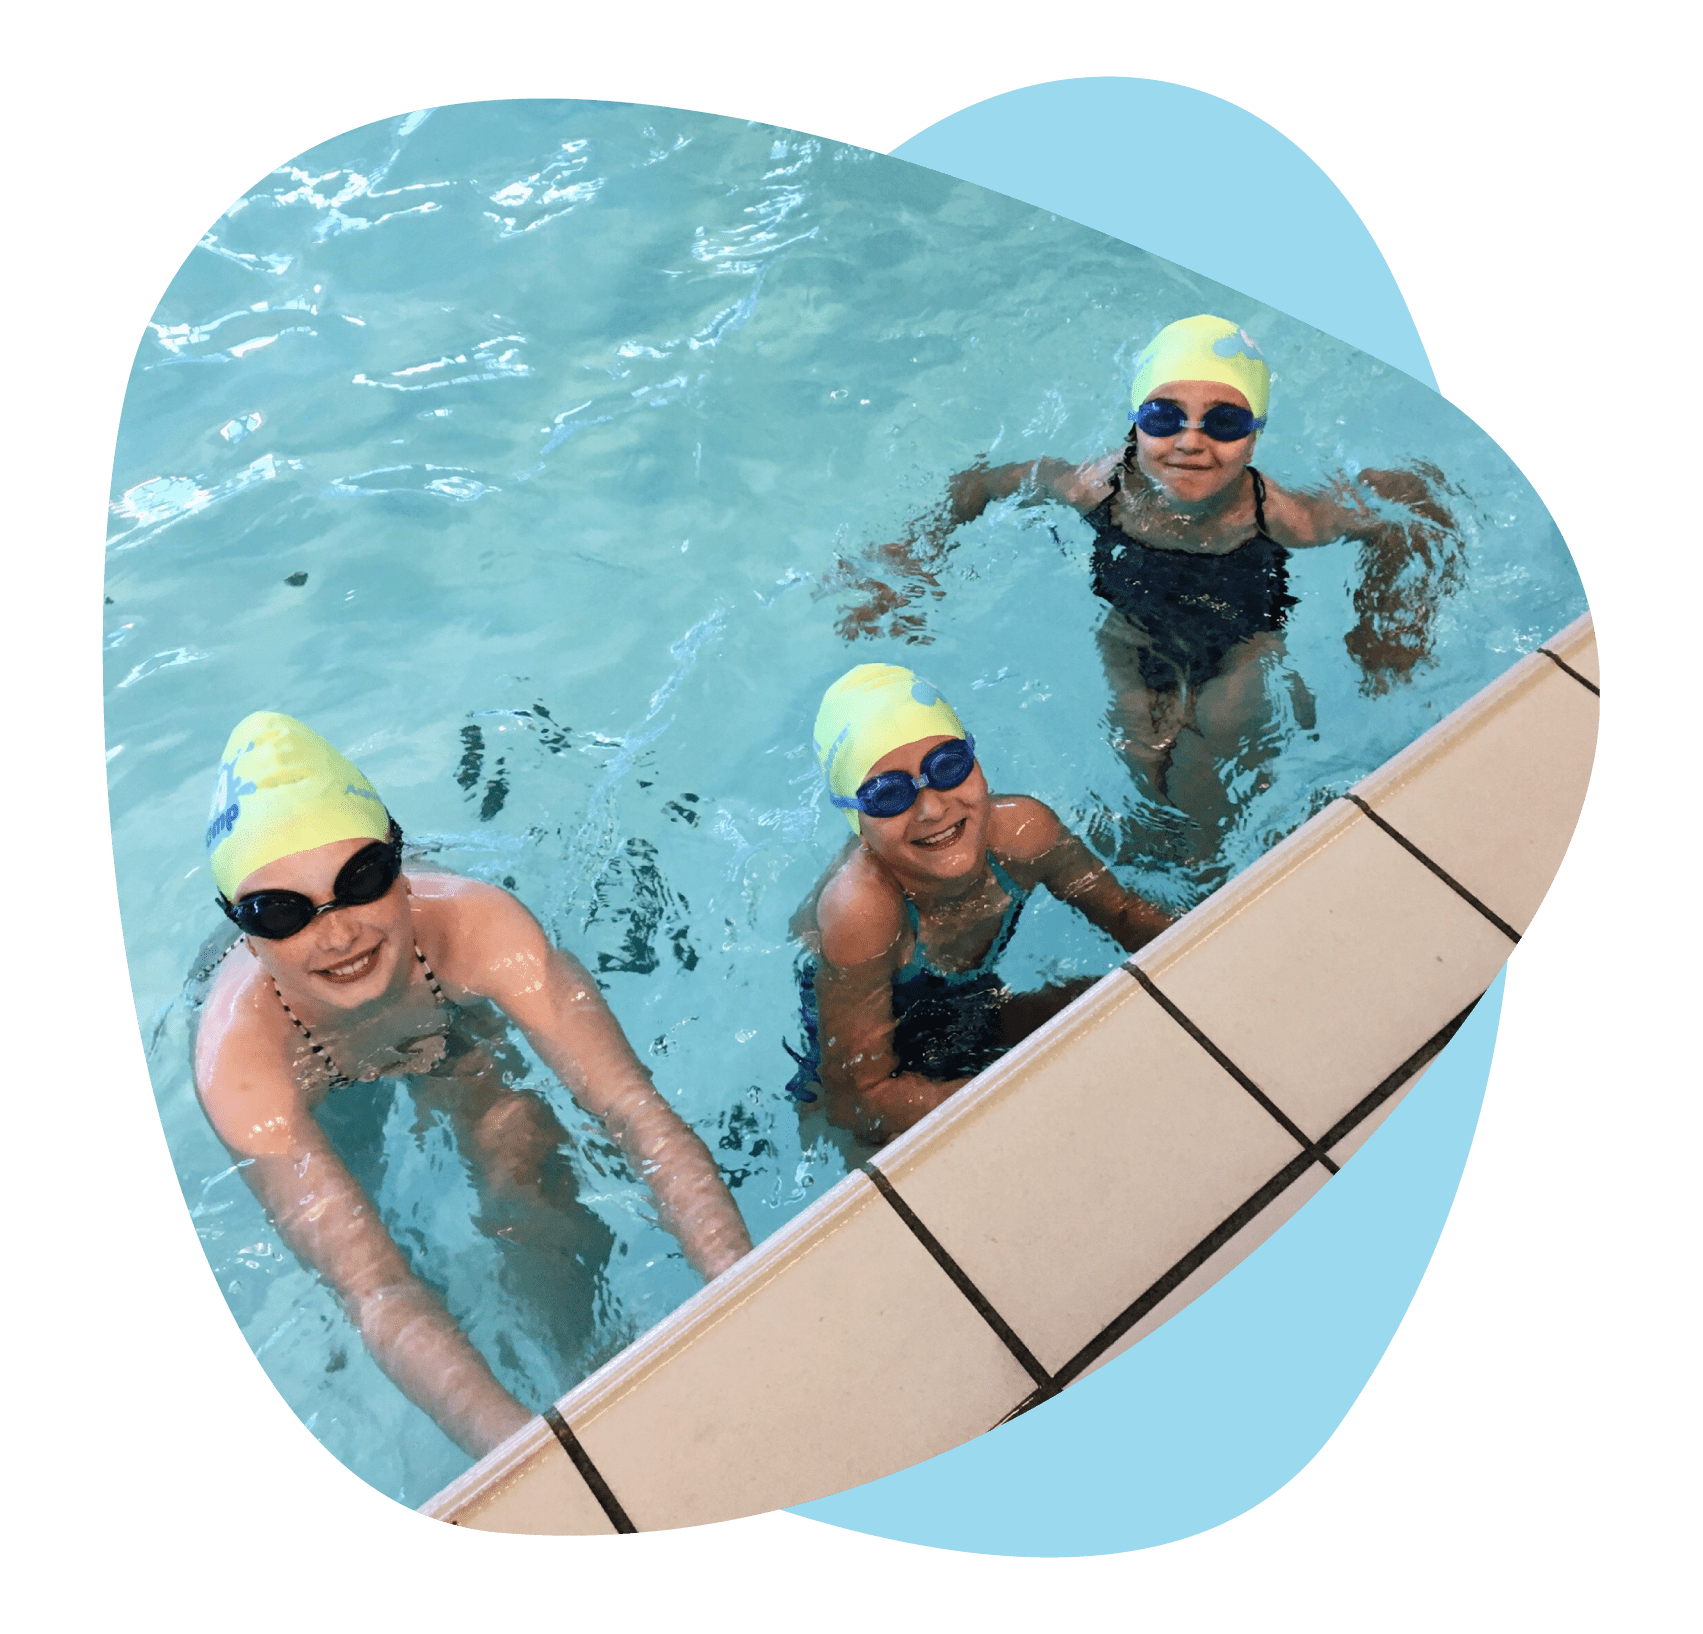 Vallensbæk Svømmeklub